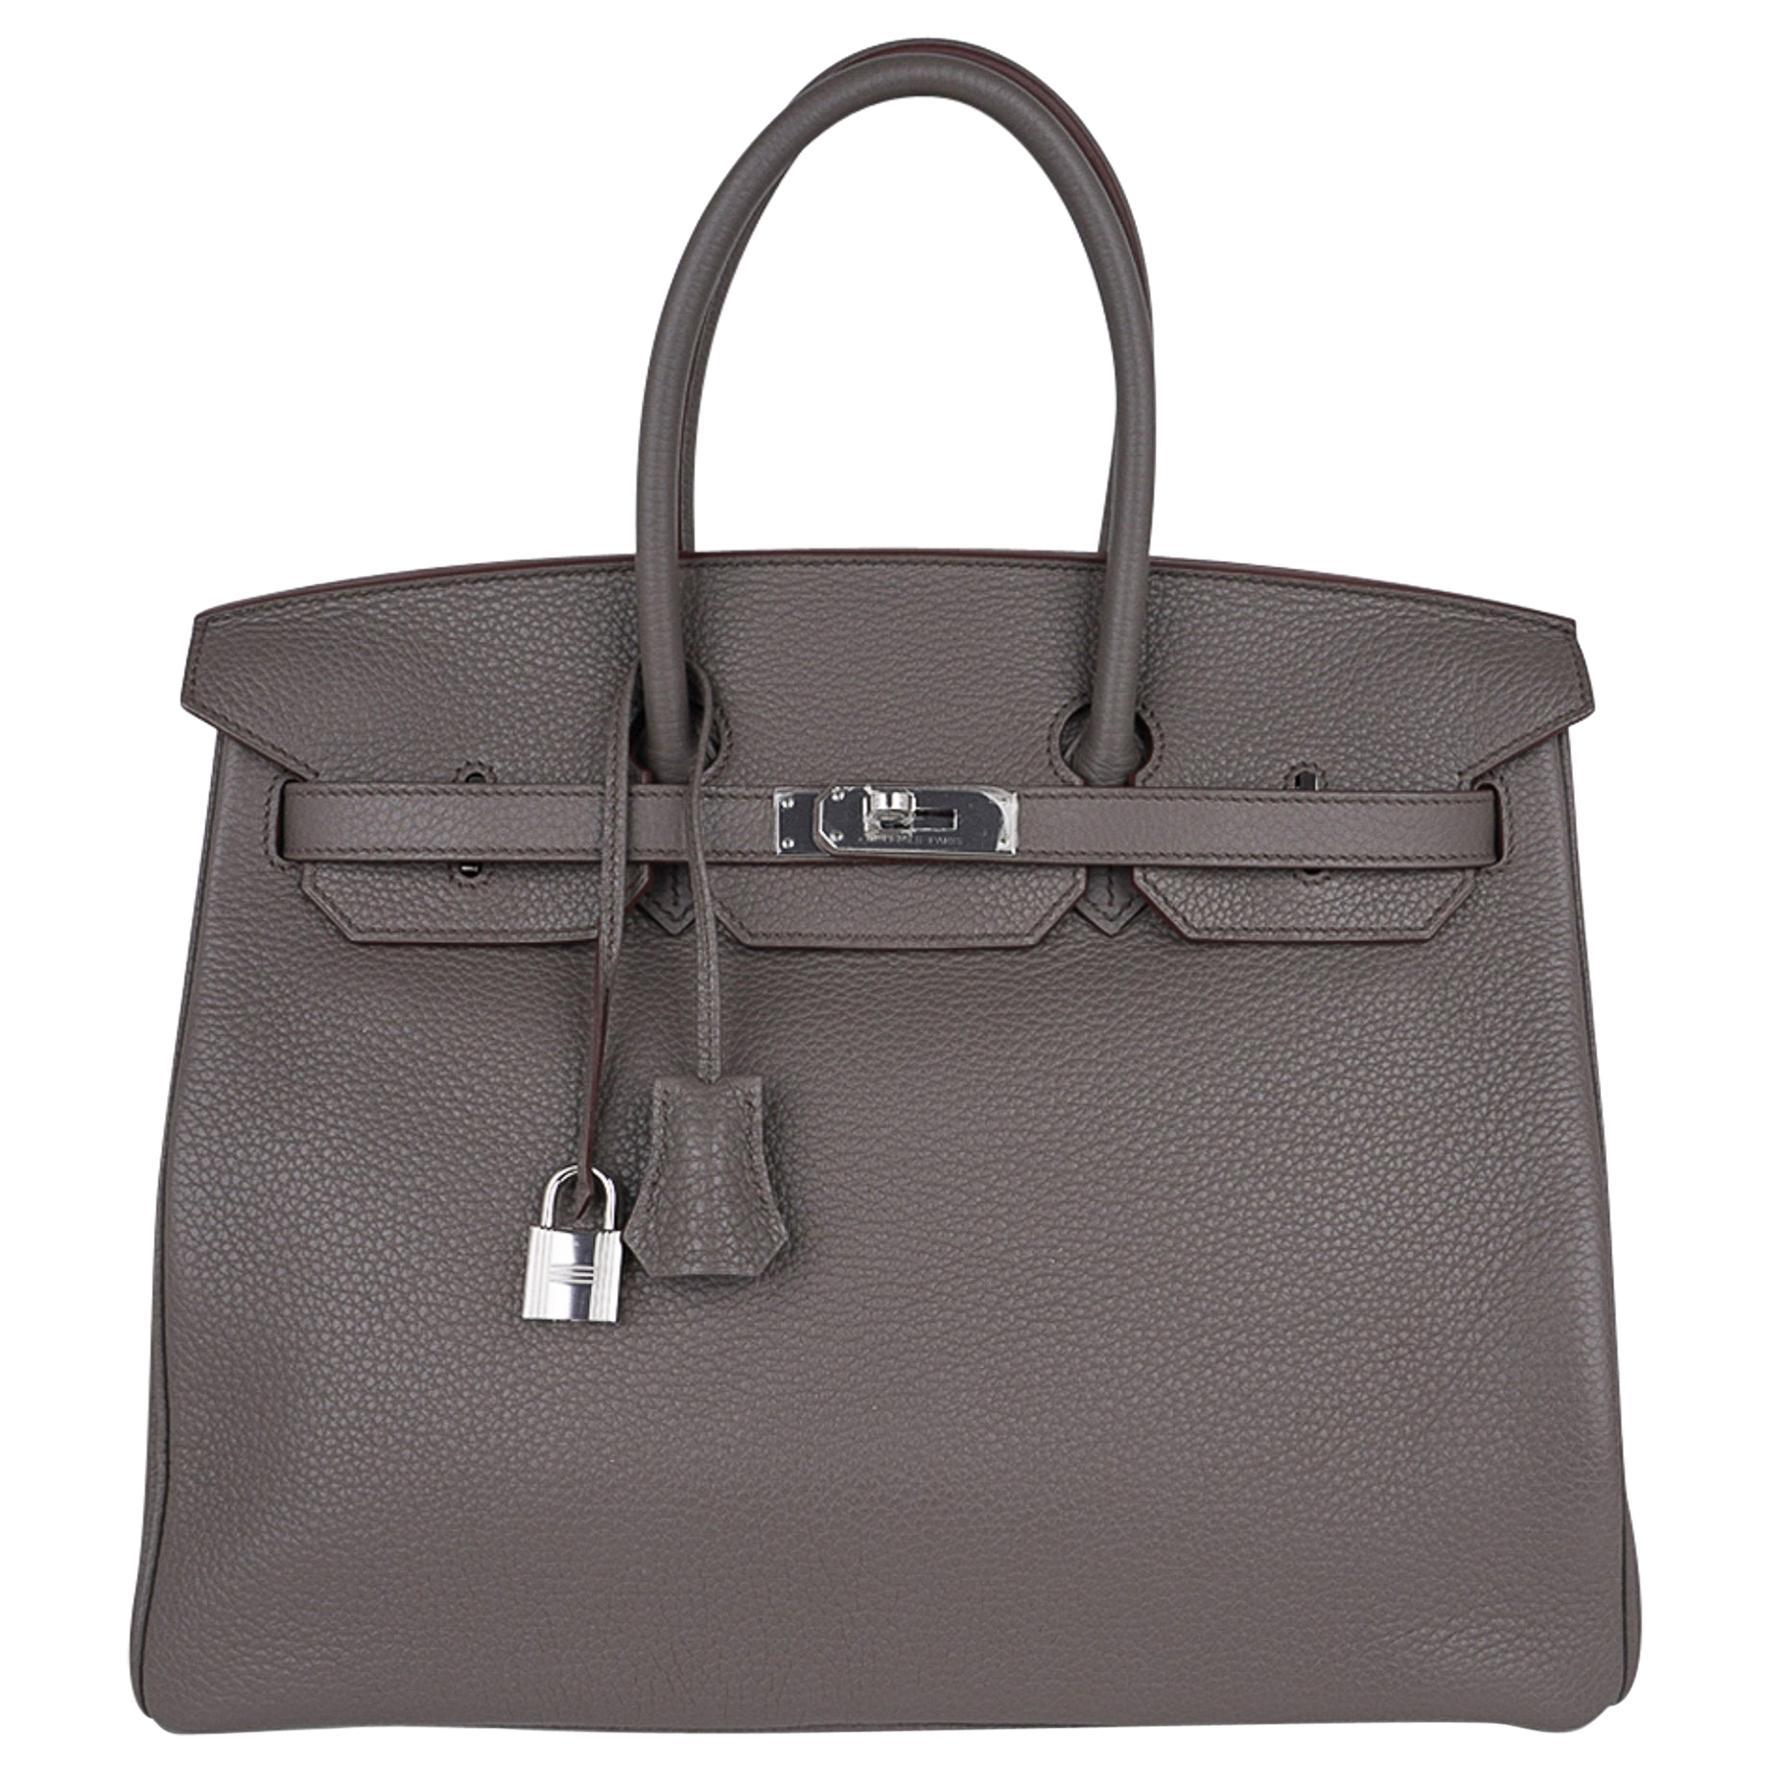 Hermes Birkin 35 Bag Etain Gray Clemence Leather Palladium Hardware